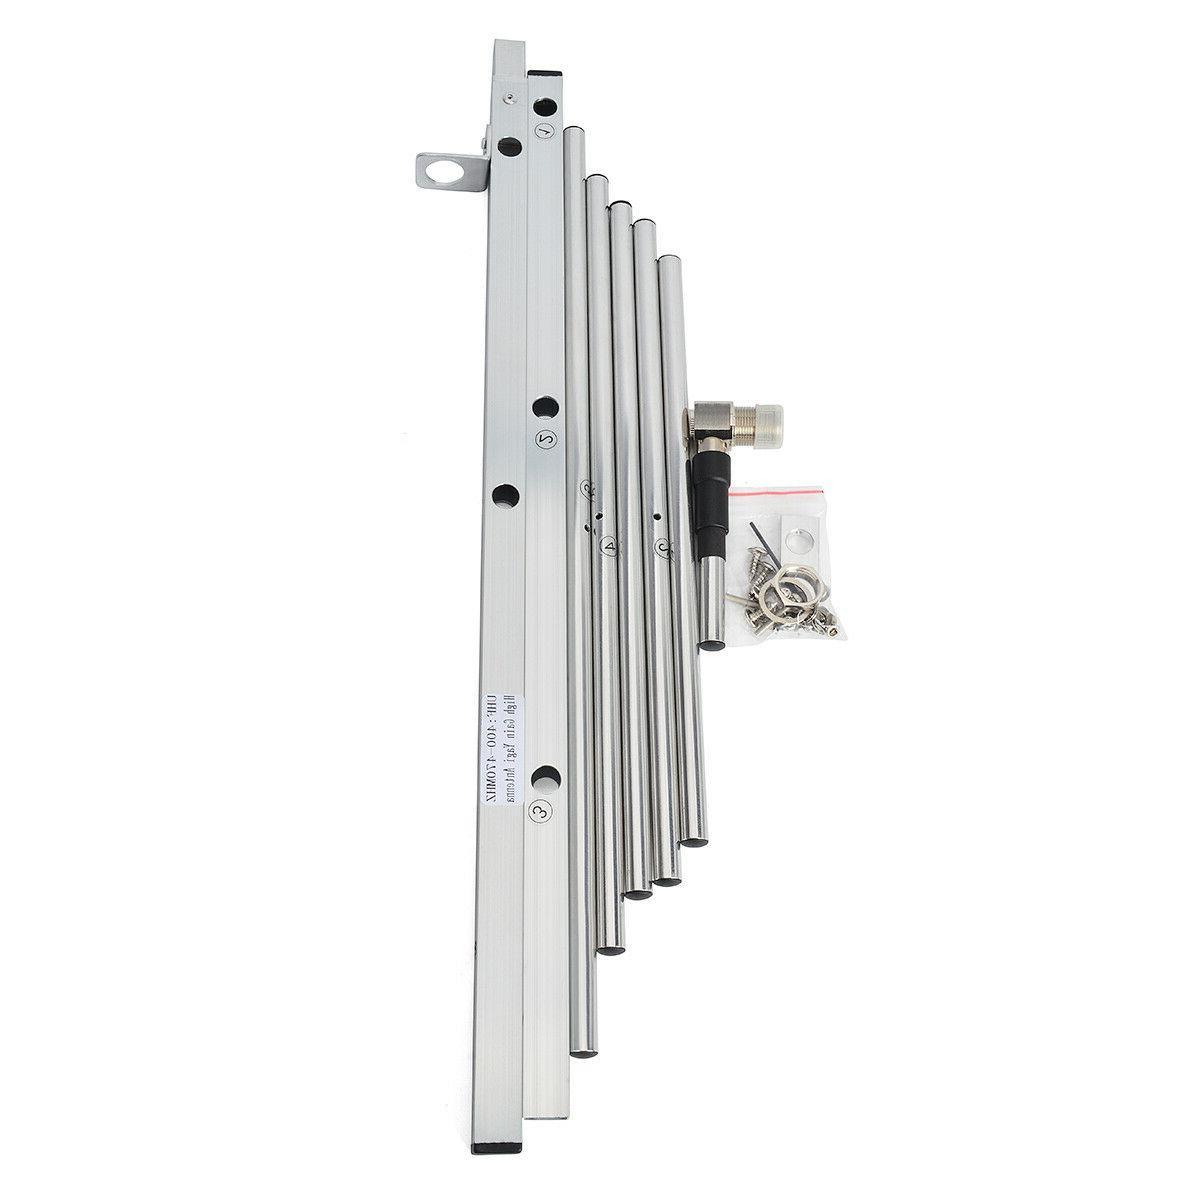 HYS UHF Directional Antenna Yagi 400-470MHz 5 Elements Gain